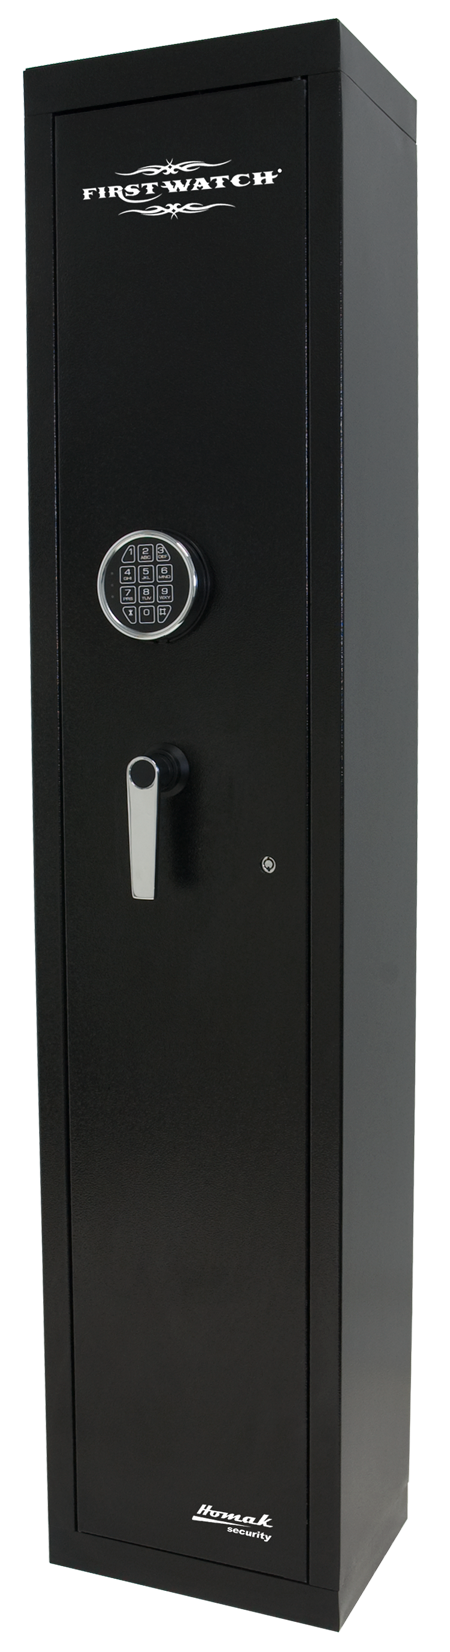 Homak Security - HS40135505 - 5 Gun RTA Cabinet